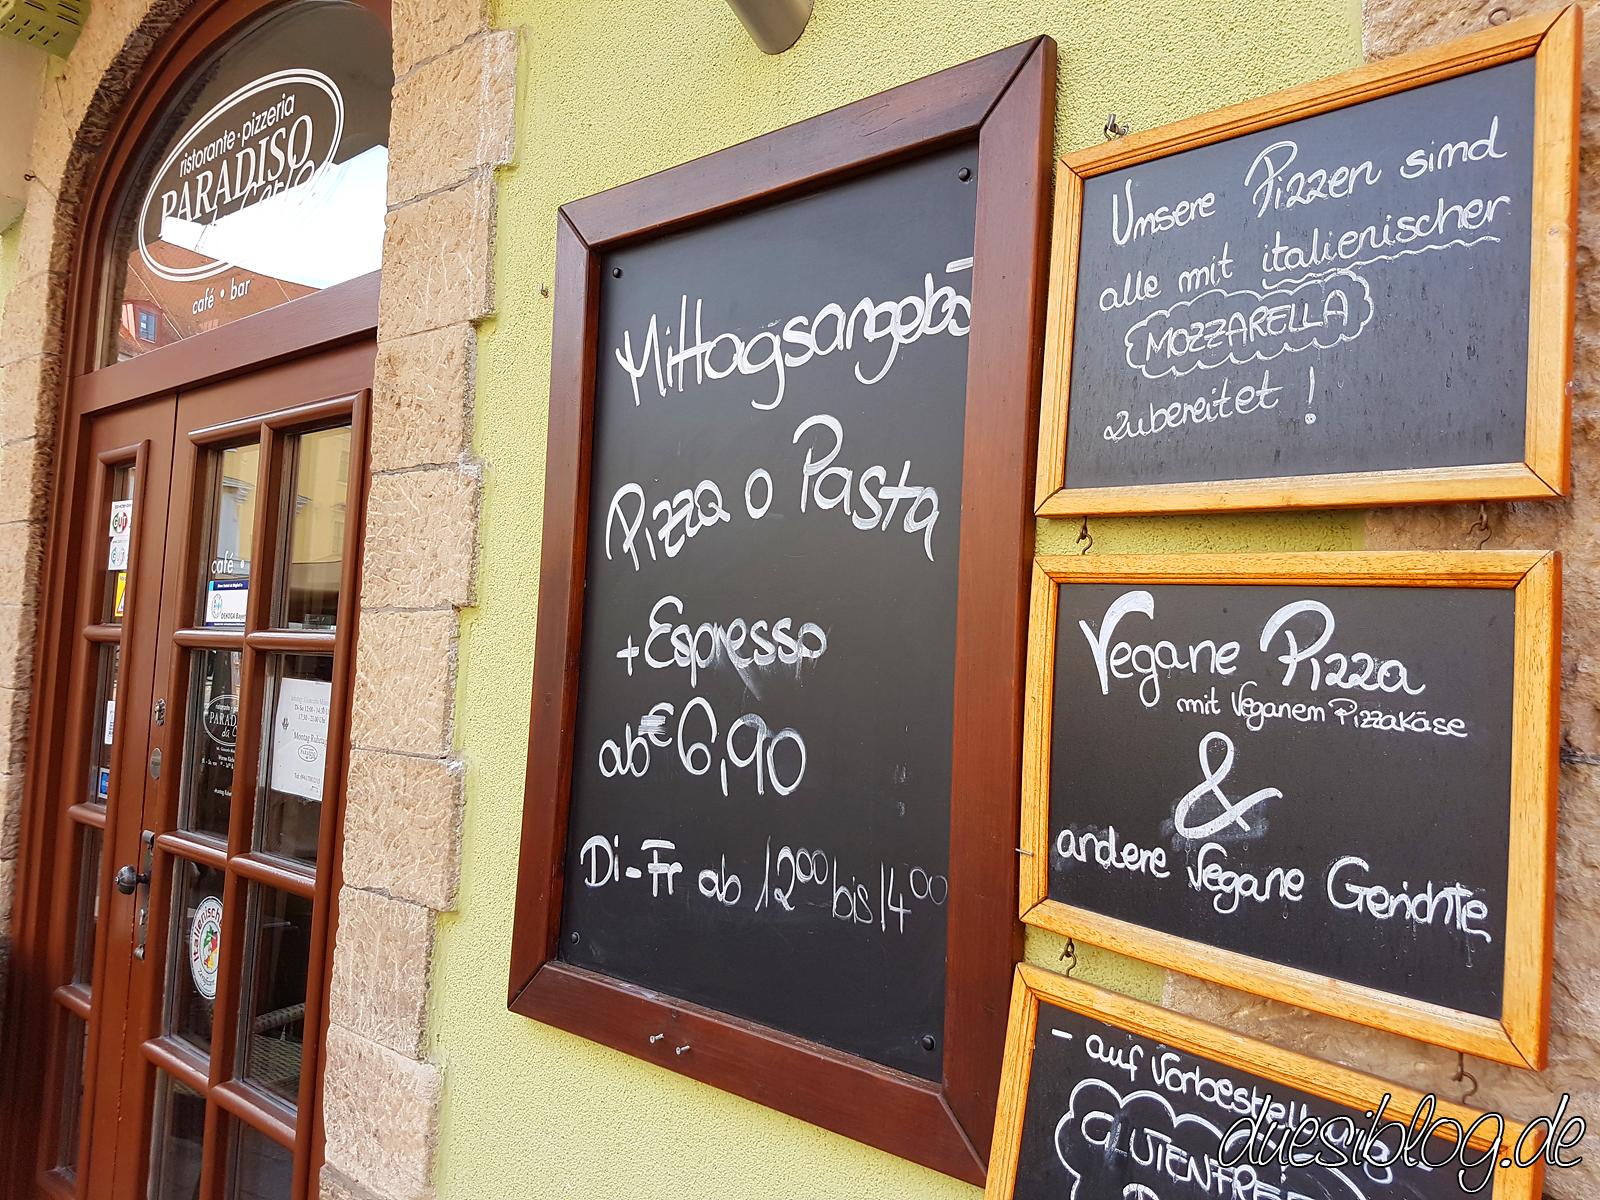 Regensburg vegan Travelblog duesiblog 01